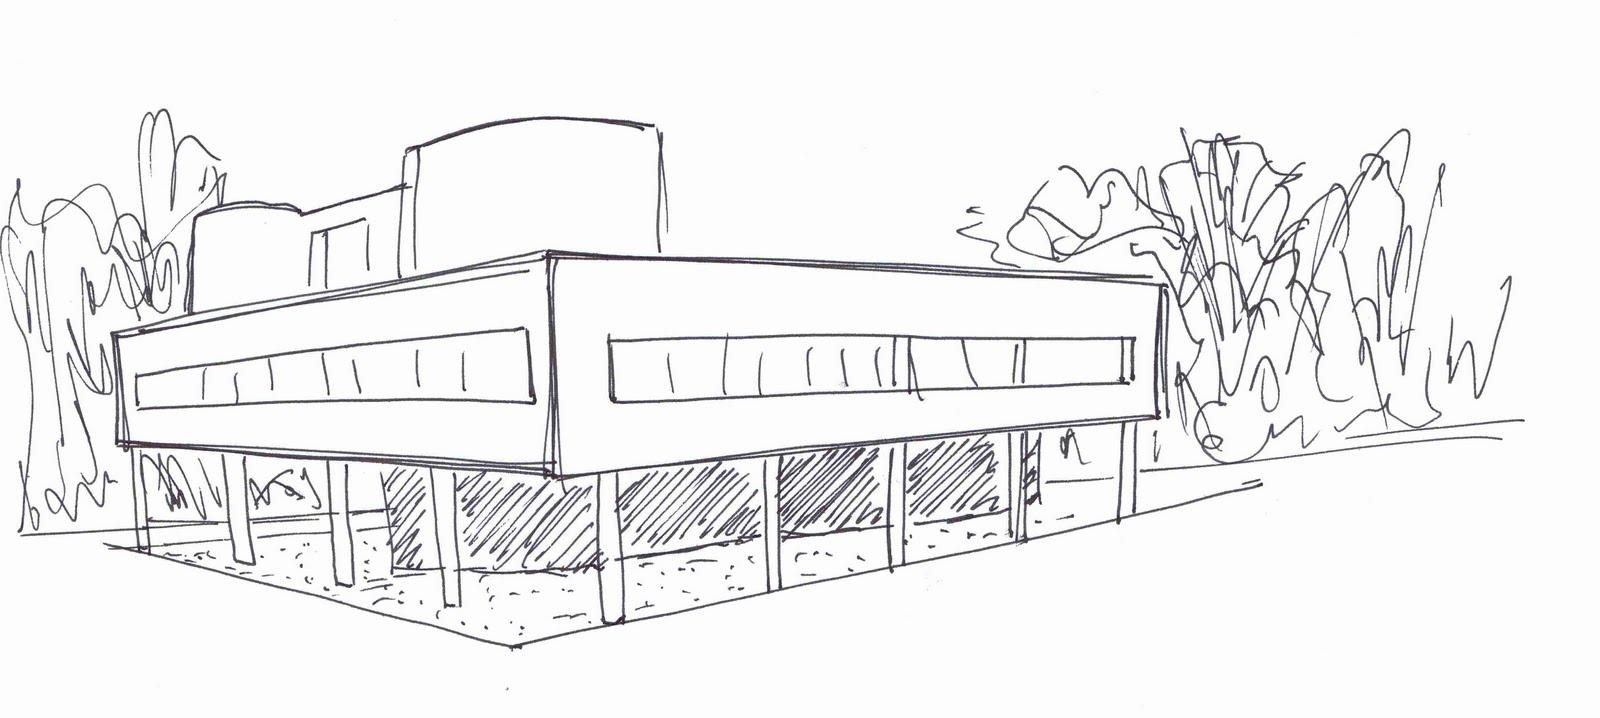 Buscando El Camino Dibujos Arquitect Nicos 1